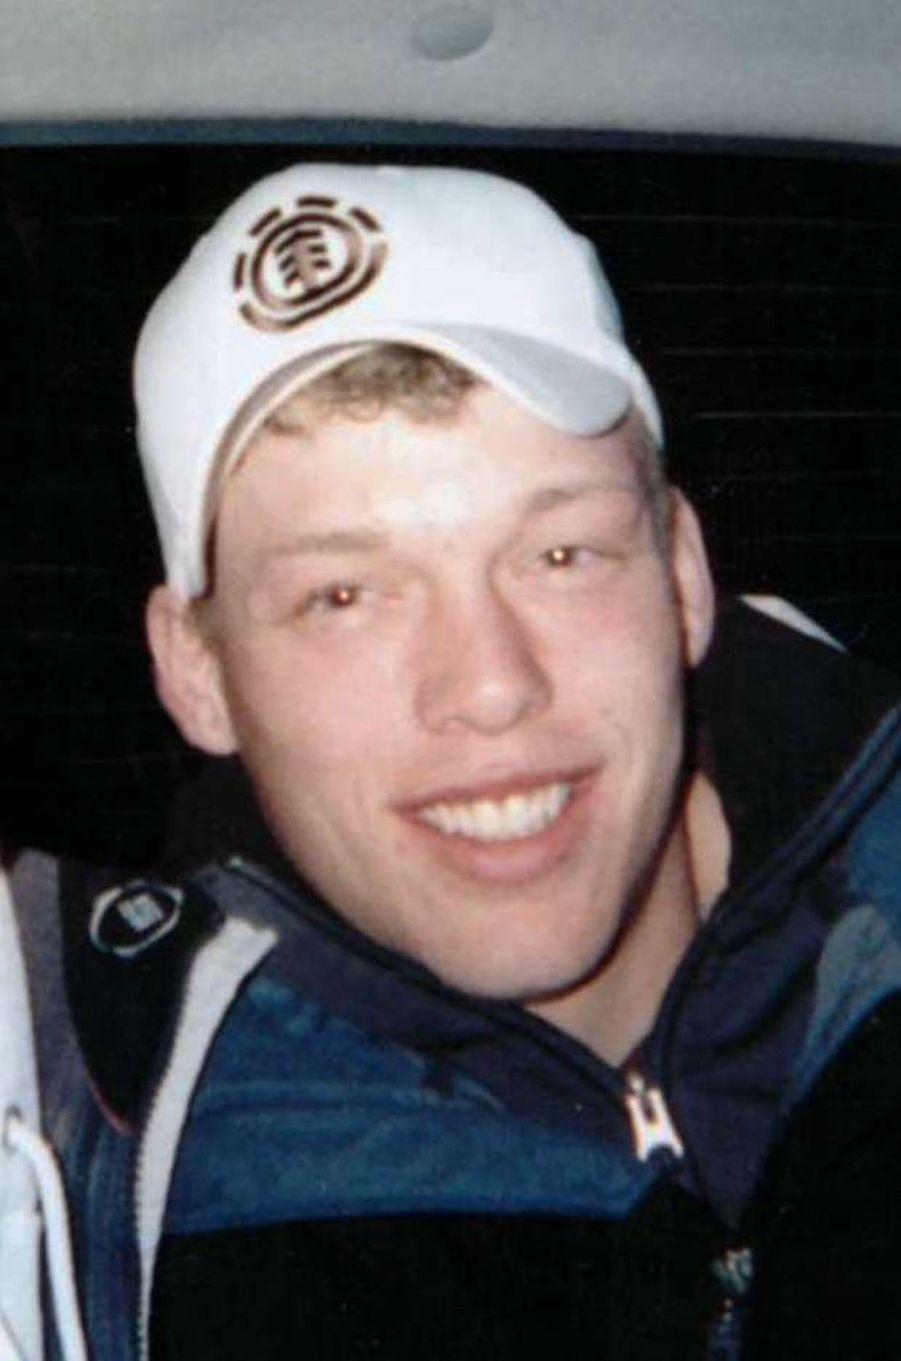 Andy Sandness avant sa tentative de suicide.